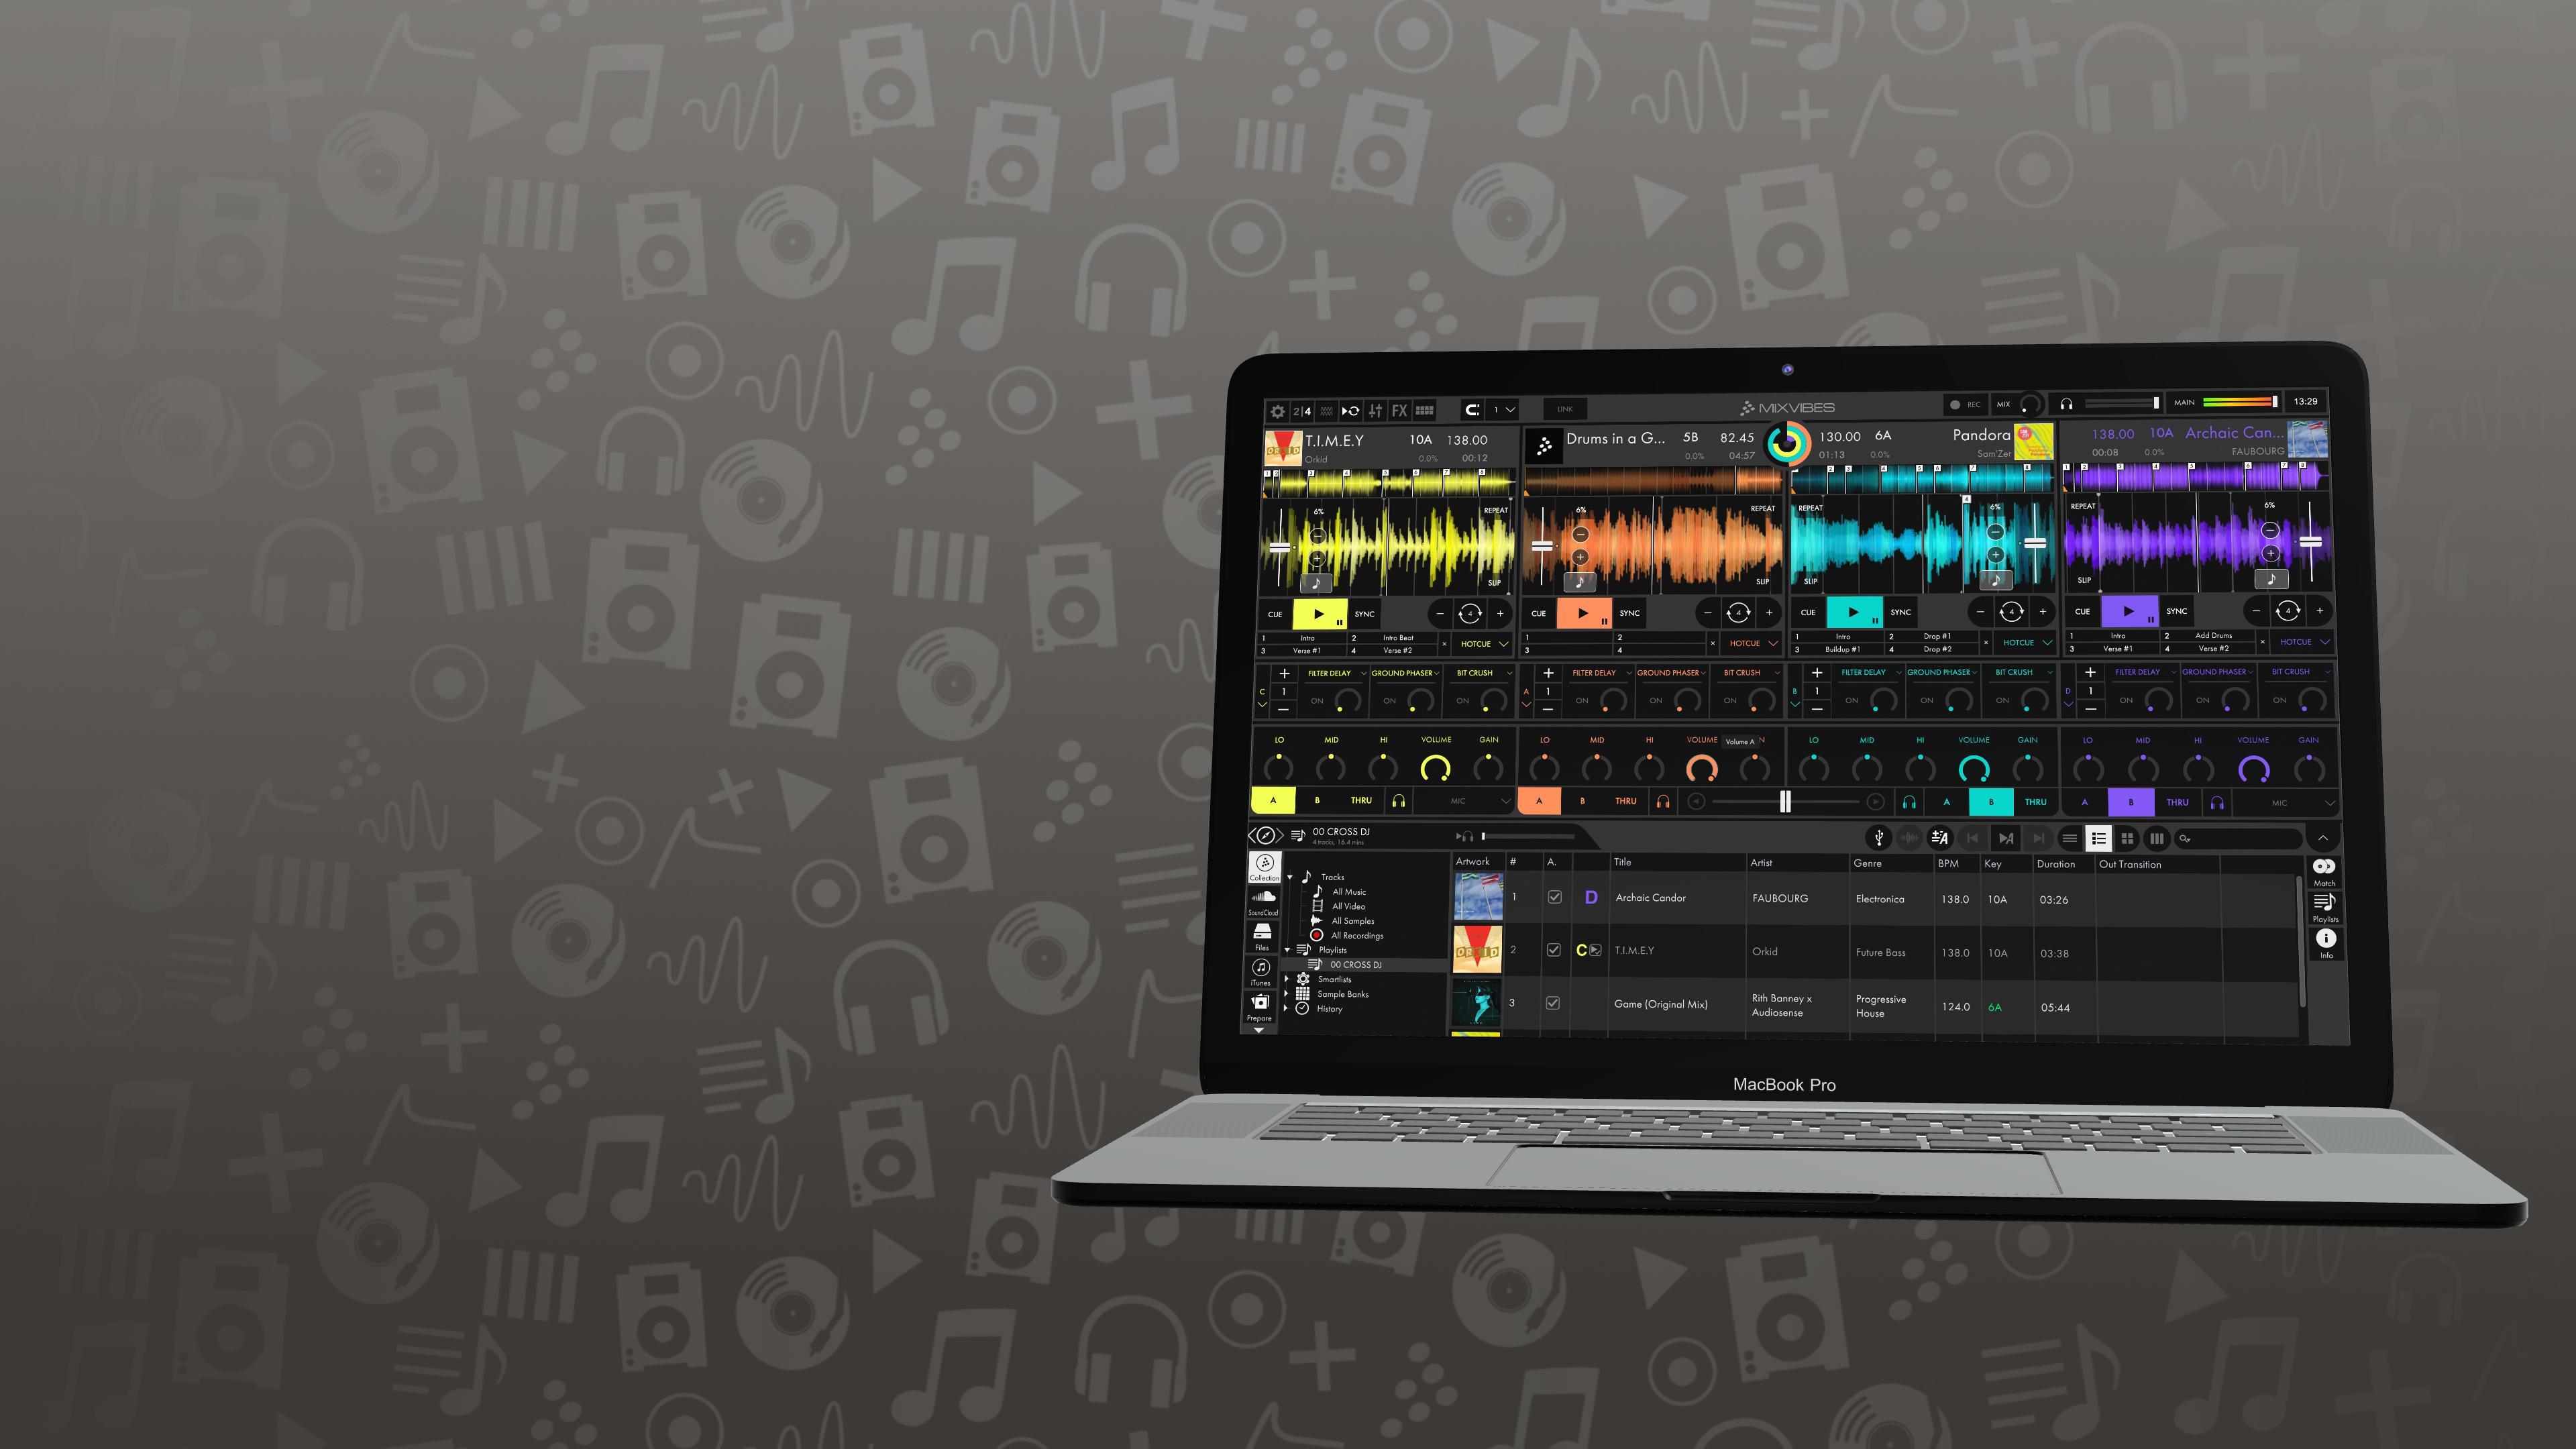 MacBook displaying Cross DJ 4's user interface